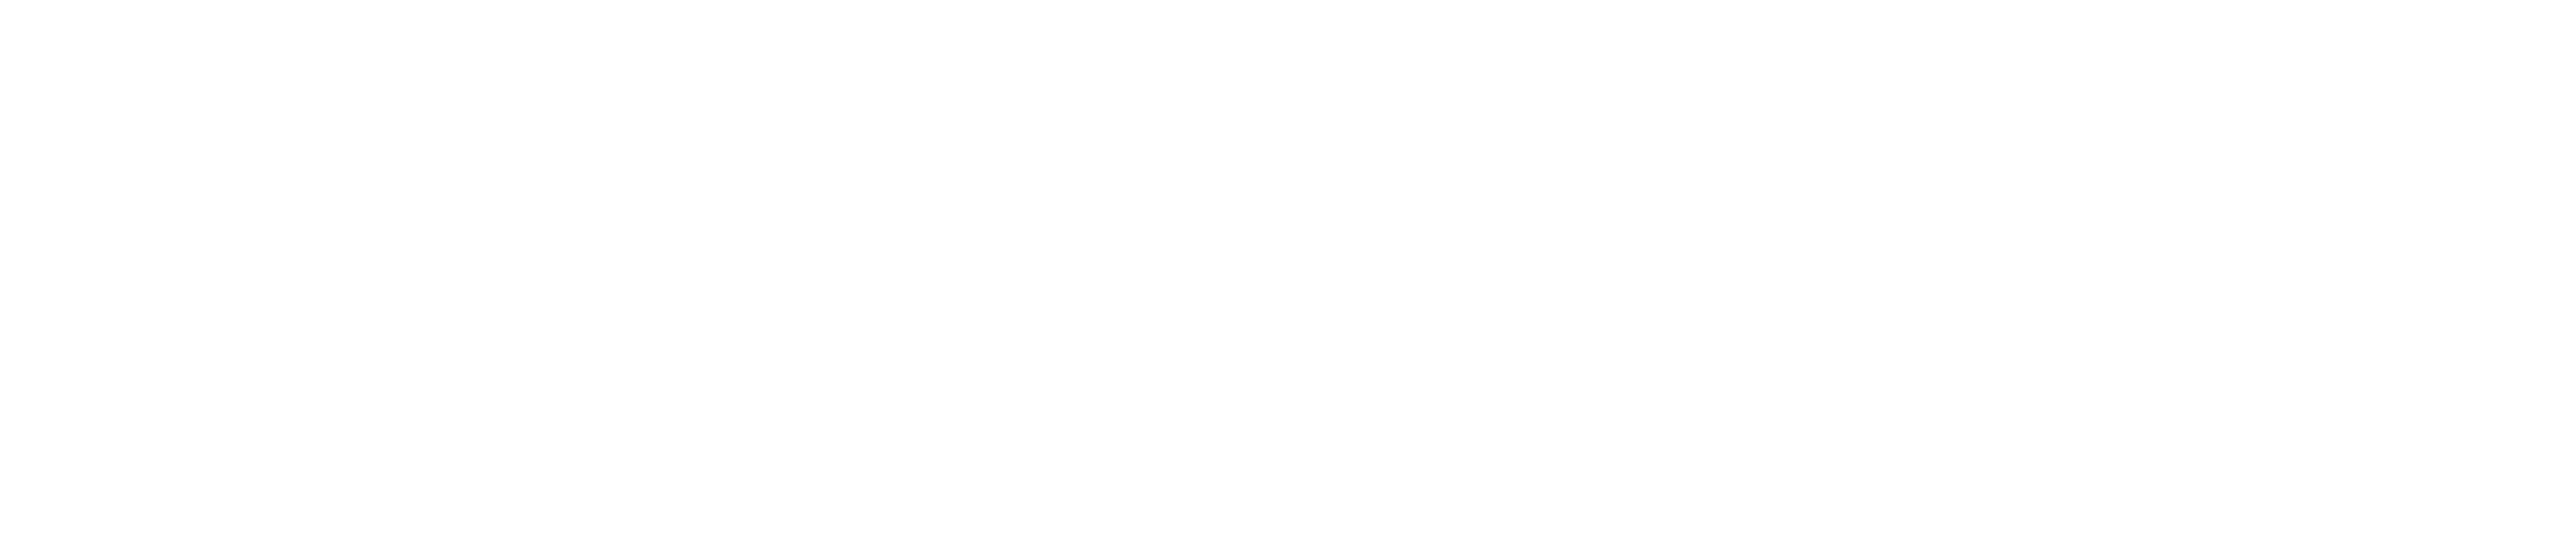 Mundwerk logopädische Praxis Logo pxmedia Webdsign Gestaltung